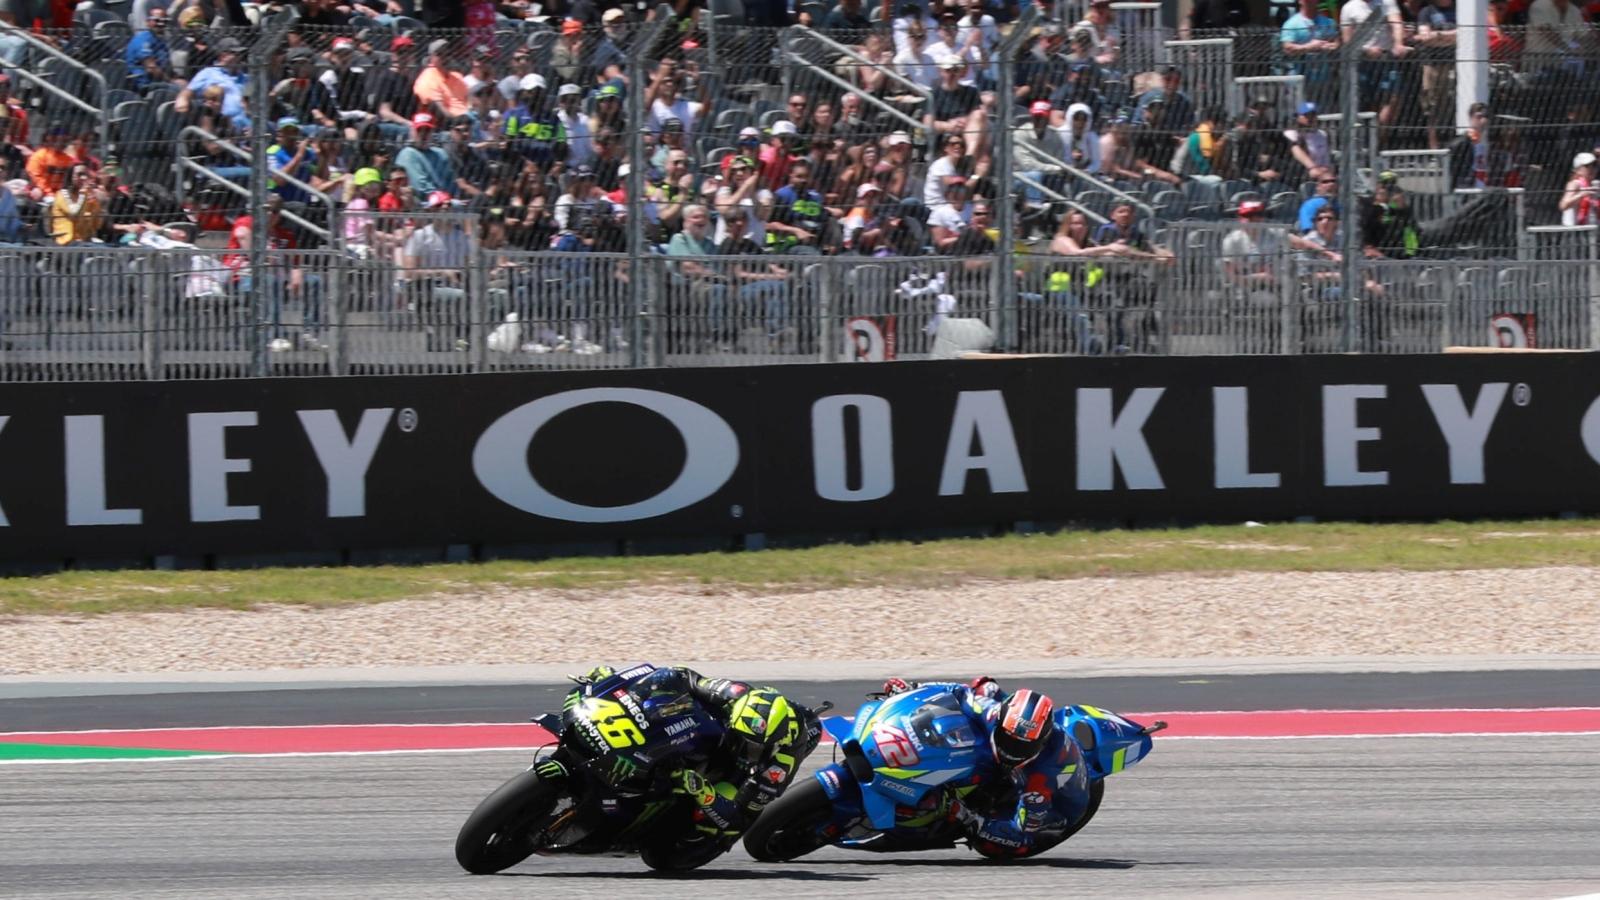 25 años Valentino Rossi: 2019 – 7º MotoGP – Yamaha YZR-M1 / Monster Energy Yamaha MotoGP